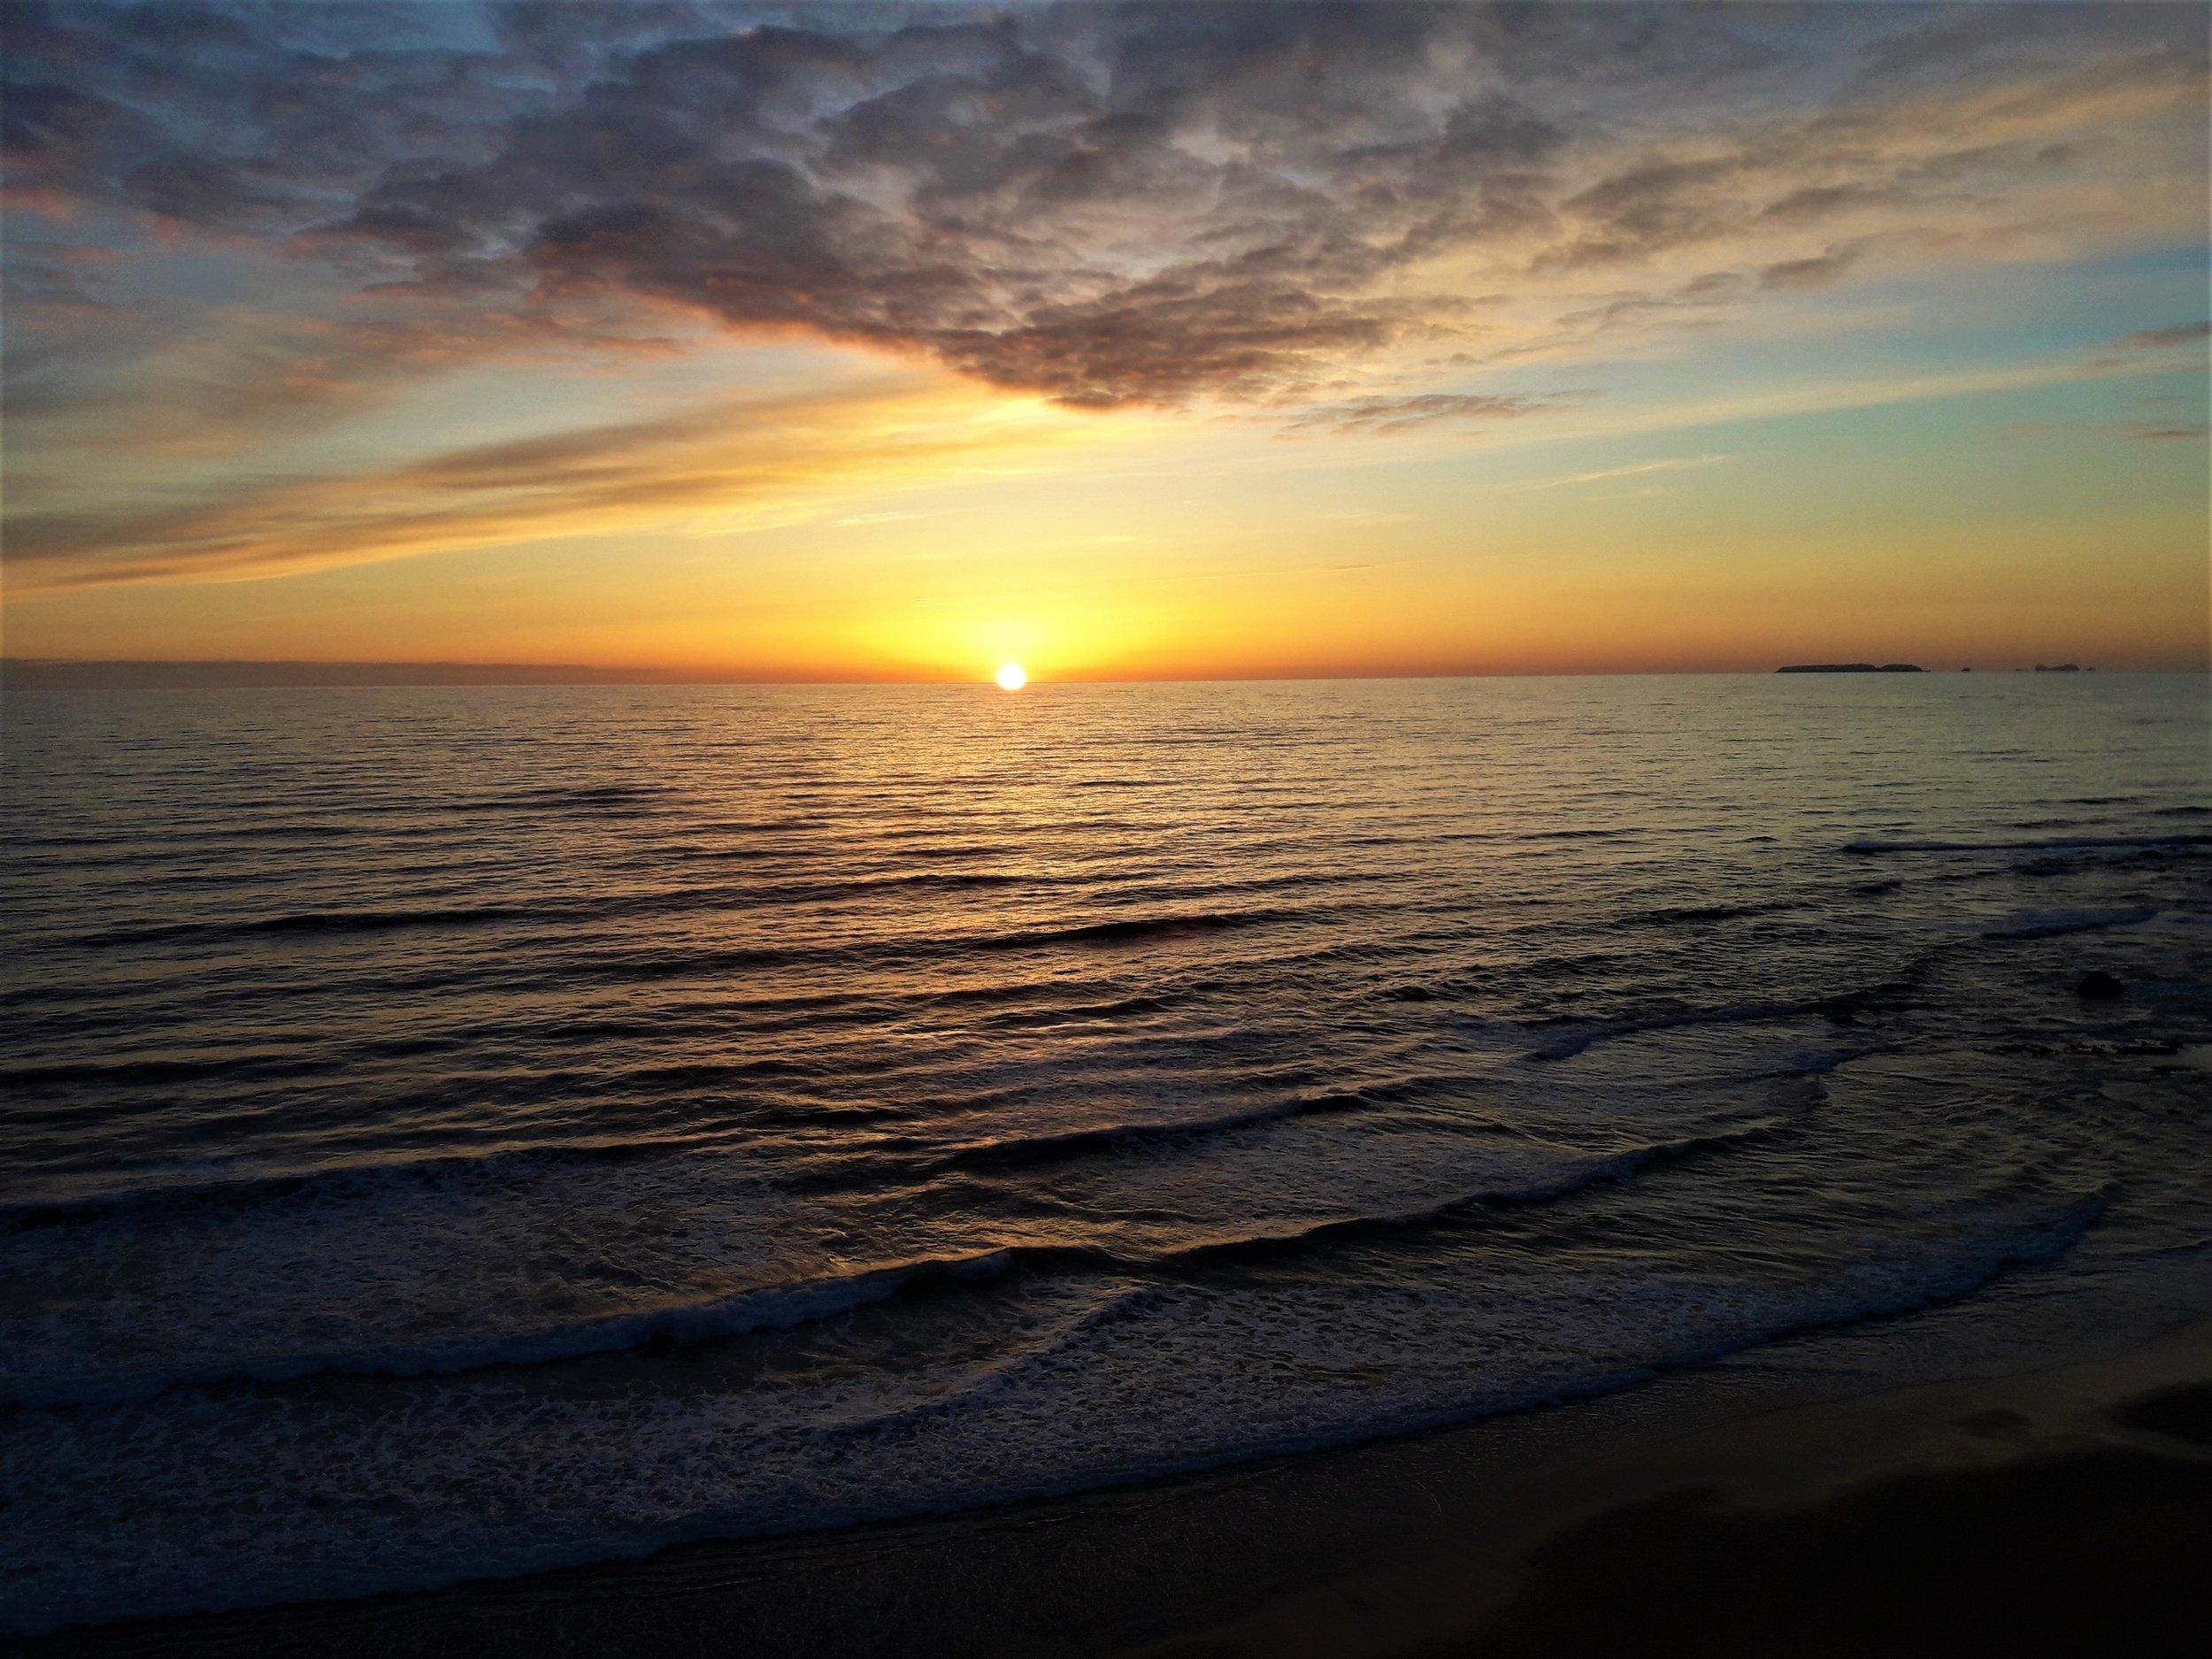 Meer-Sonnenuntergang-Strand-Portugal.jpg